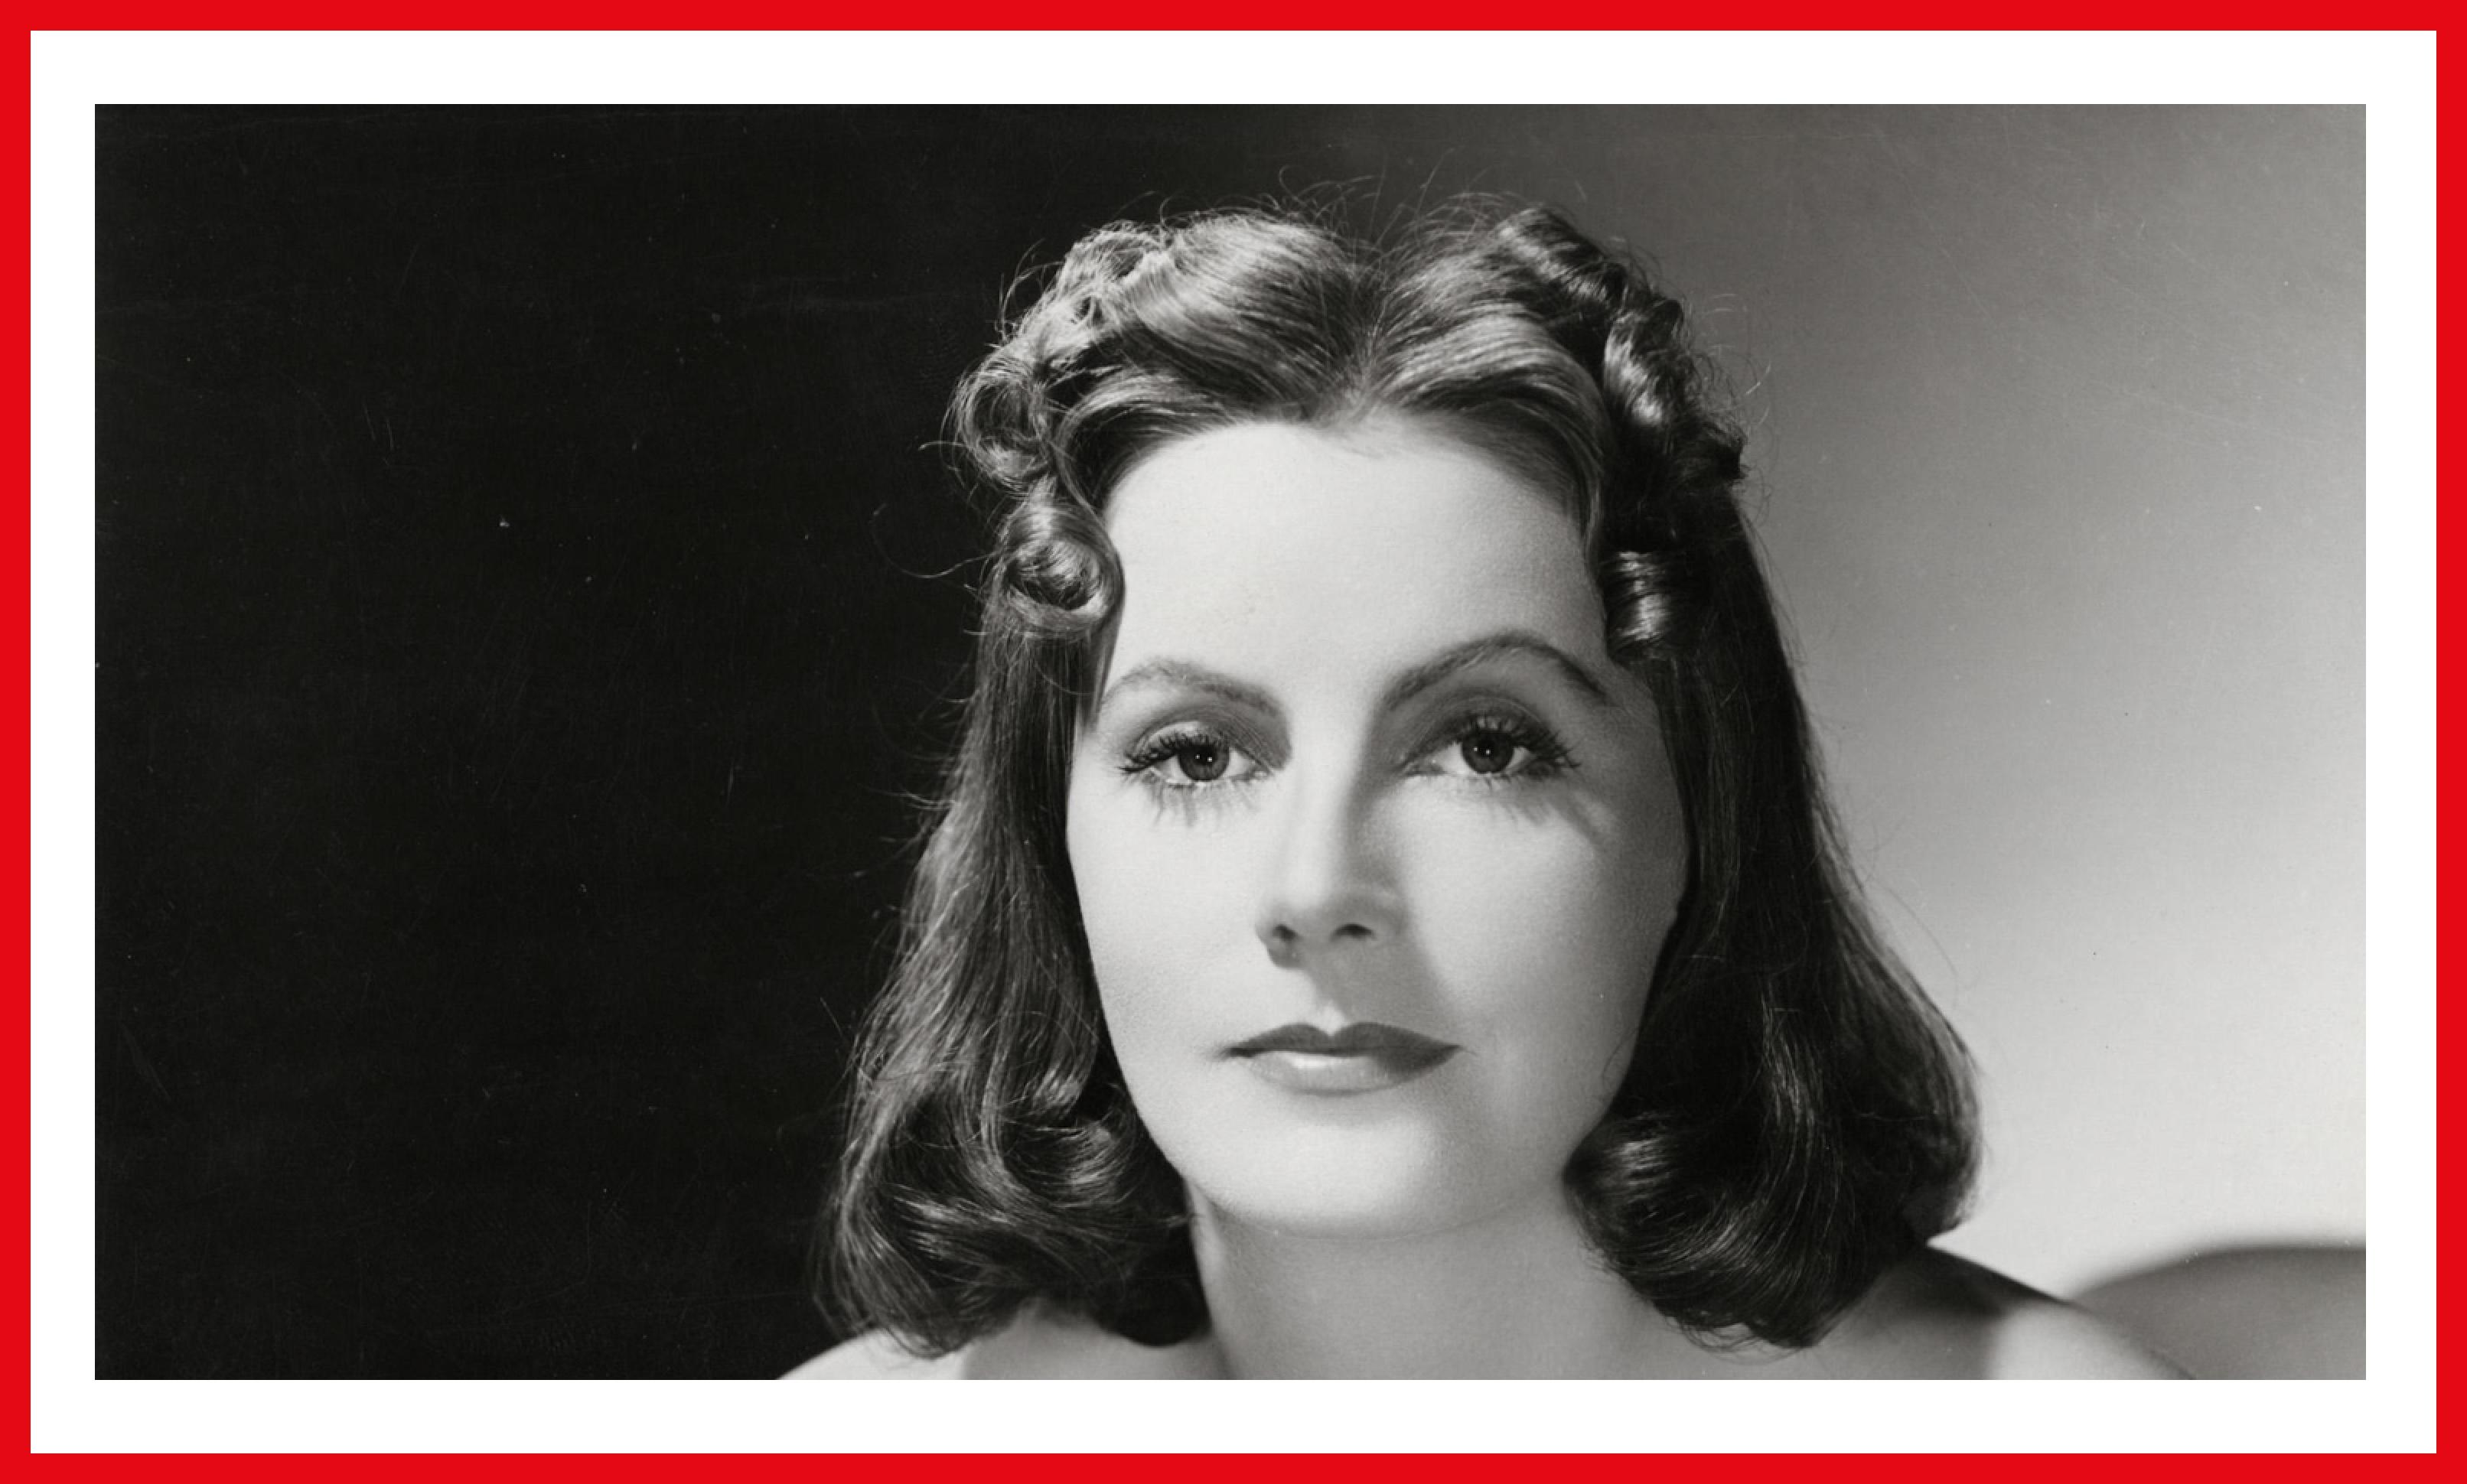 Garbo as Ninotchka, sporting a remarkable center-part.